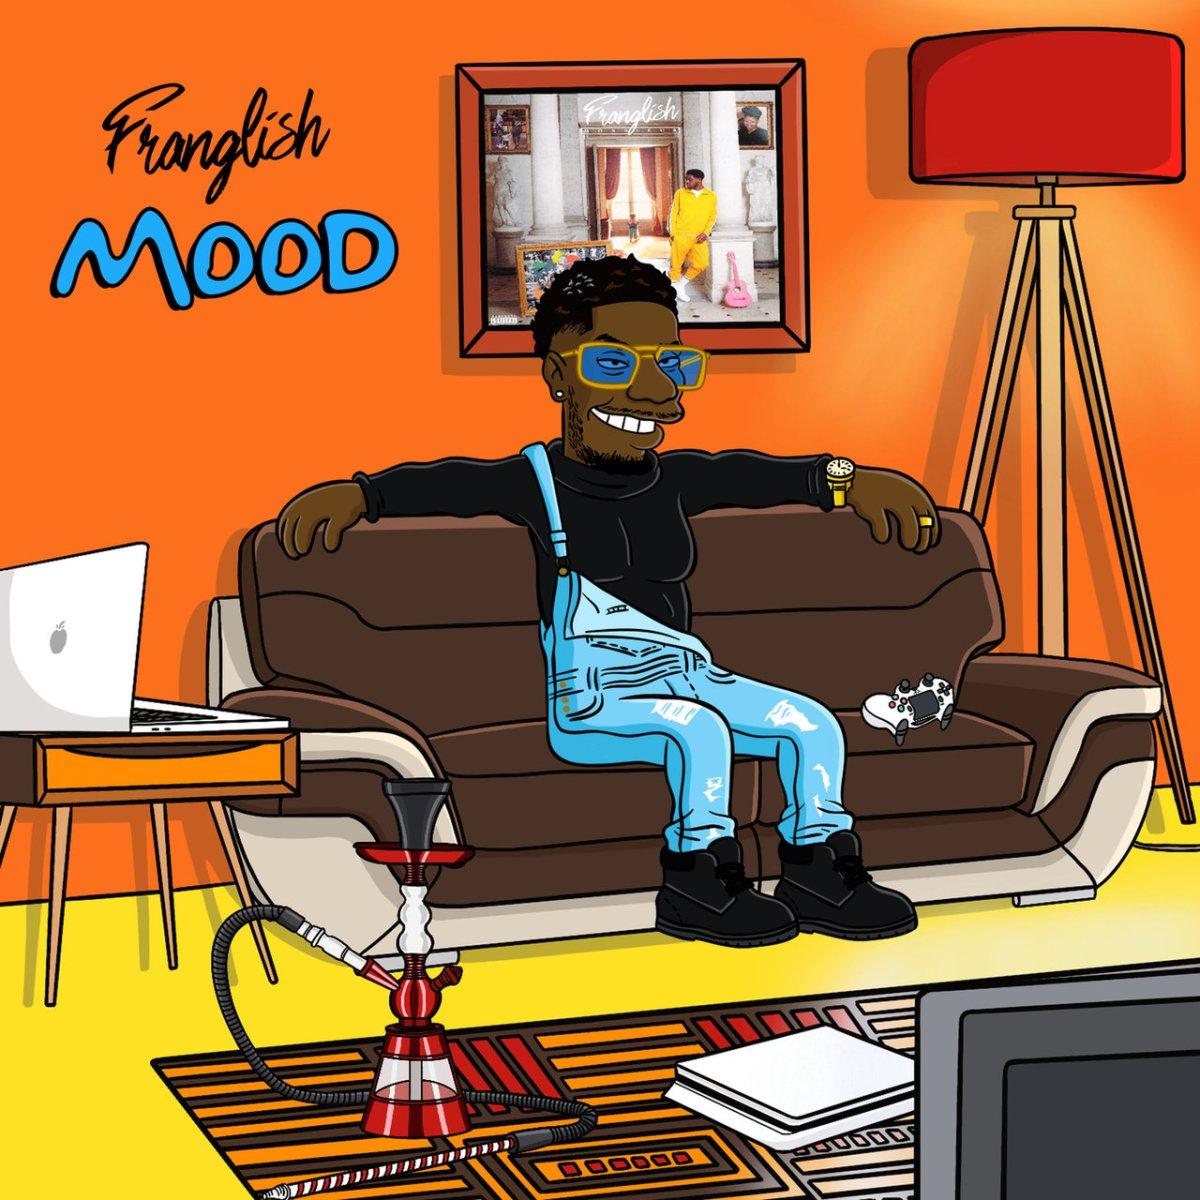 Franglish - Mood (Cover)